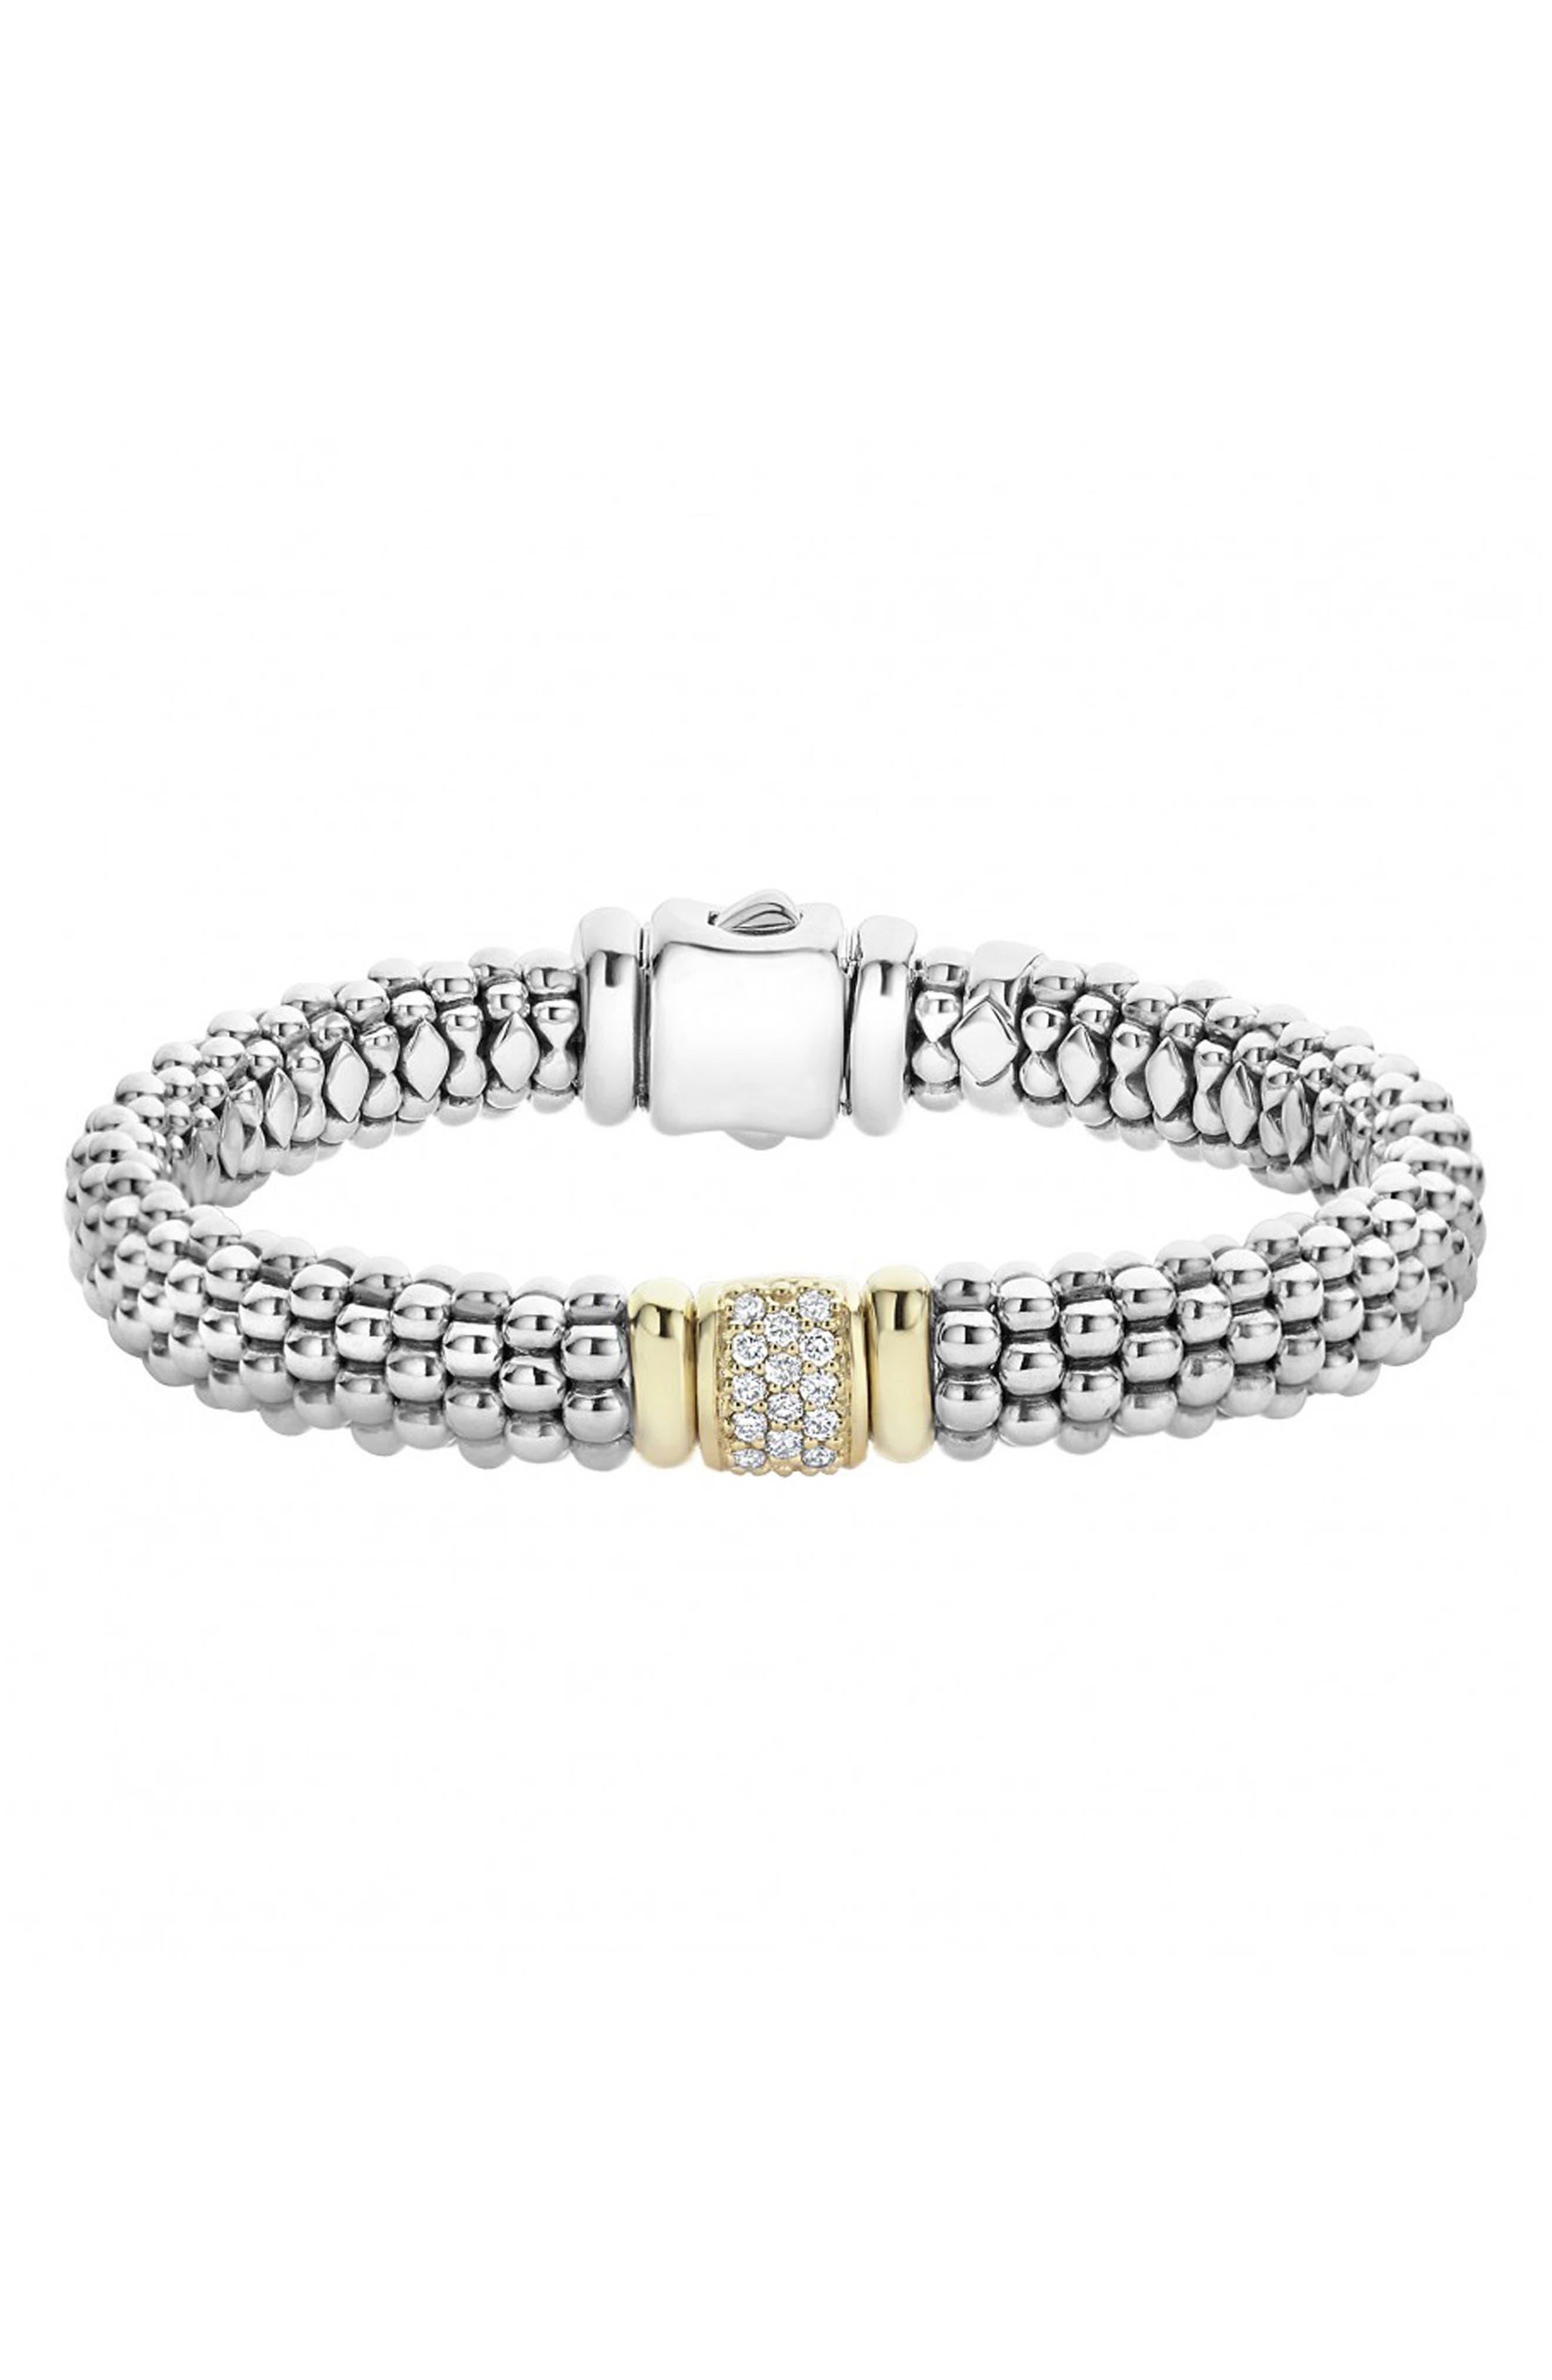 Caviar & Diamond Bracelet,                         Main,                         color, STERLING SILVER/ GOLD